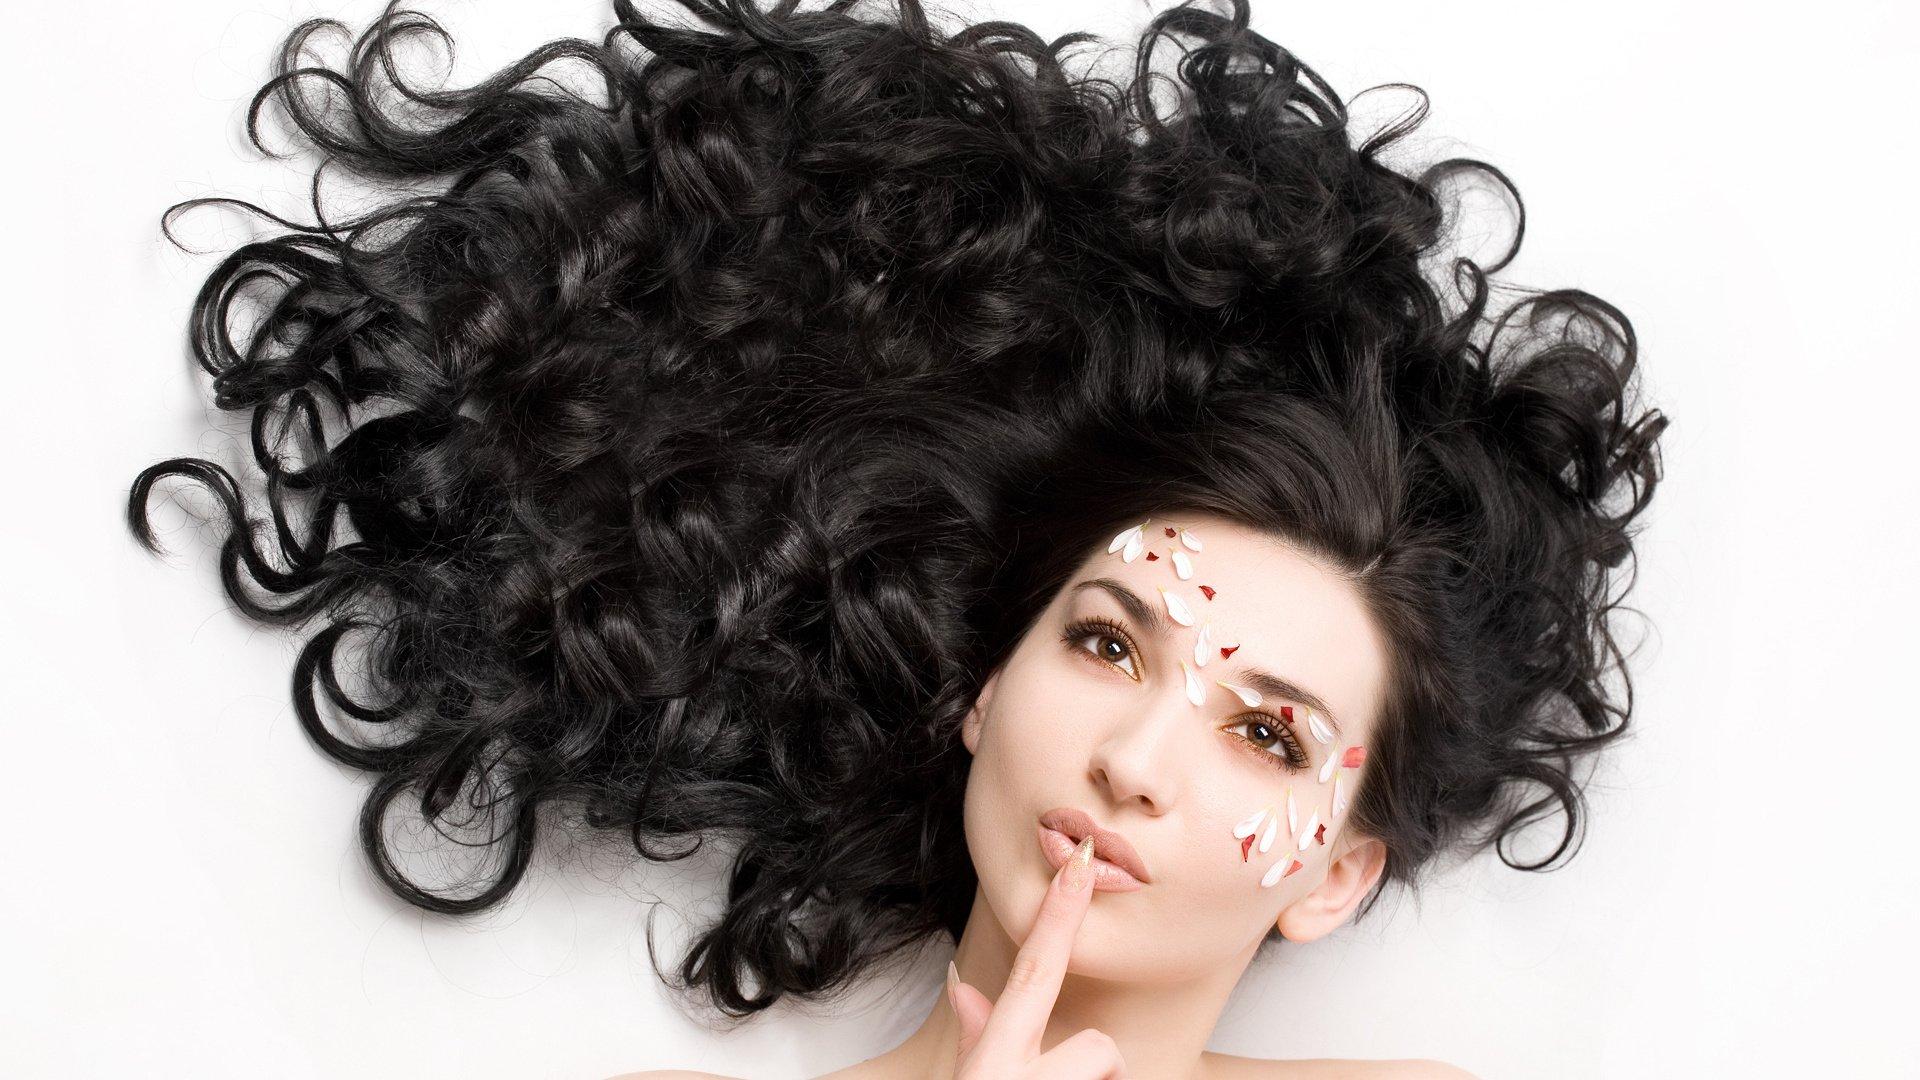 Curly Hair Style Girl Face Petals Black Hair Brown Eyes Beautiful Wallpaper 1920x1080 639126 Wallpaperup